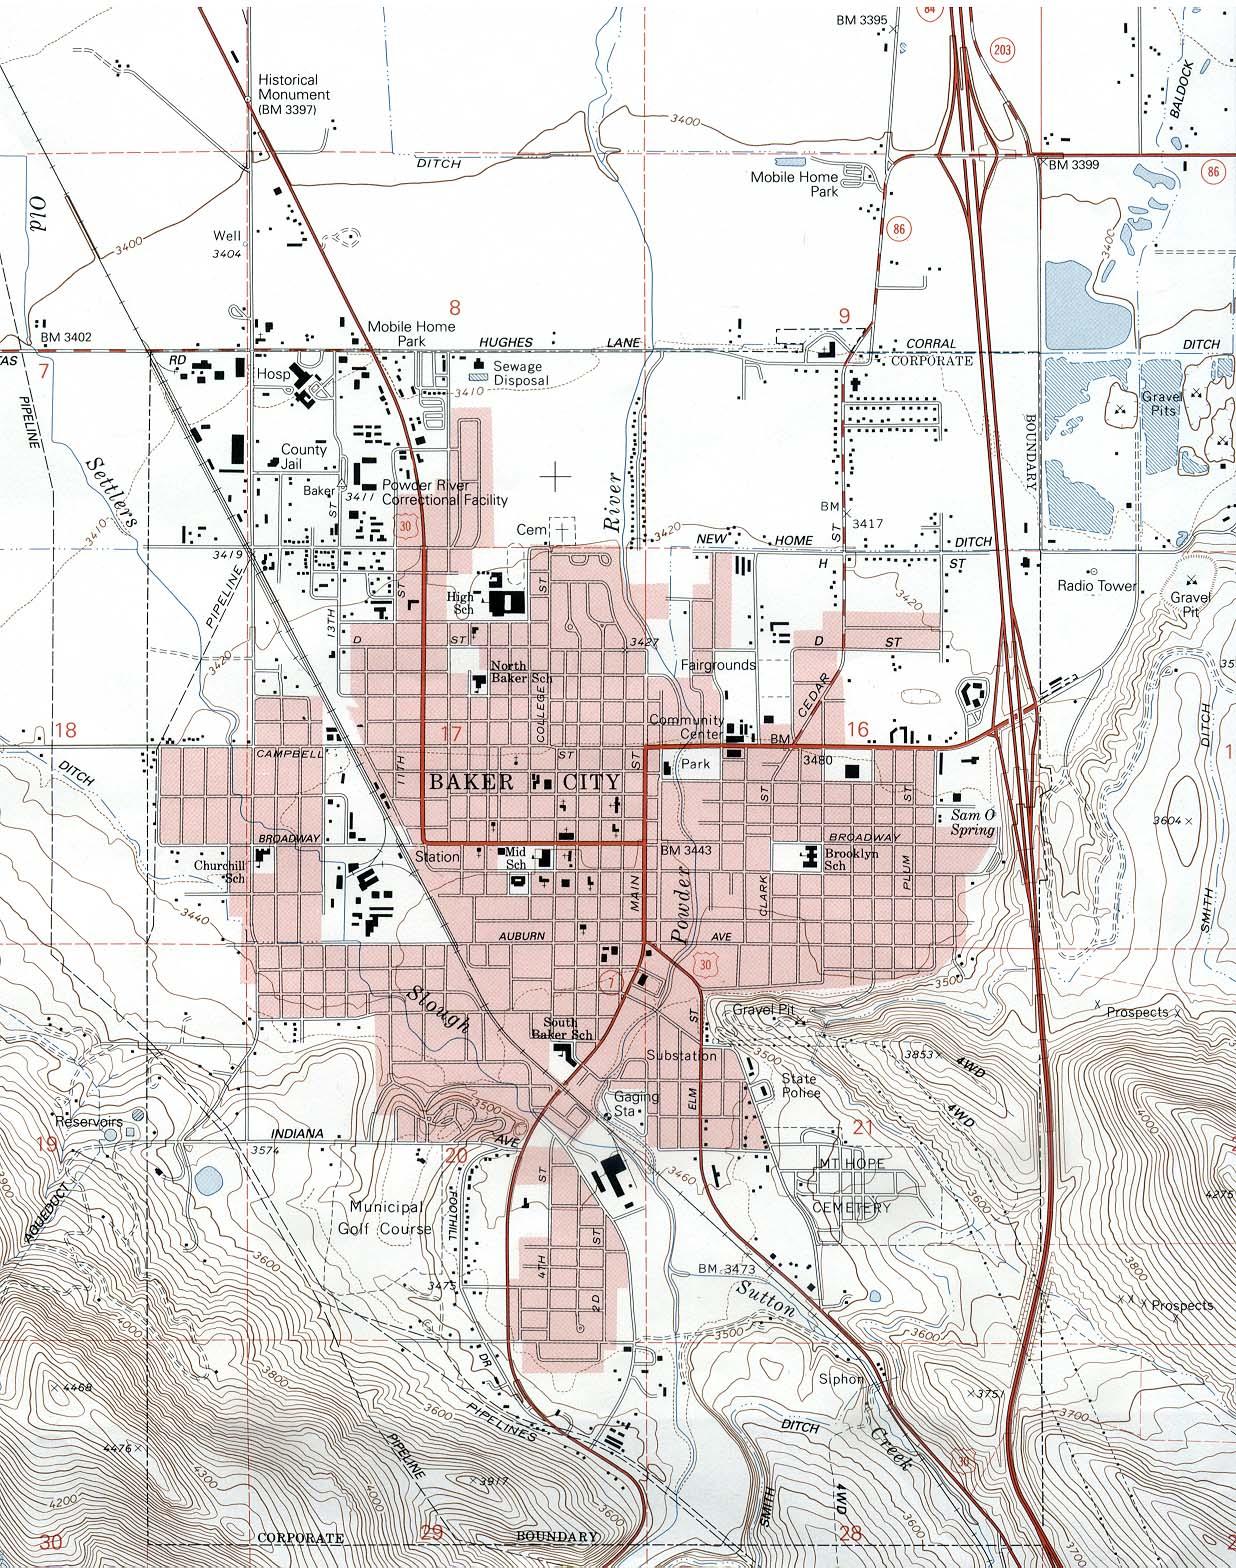 Baker City Topographic Map, Oregon, United States